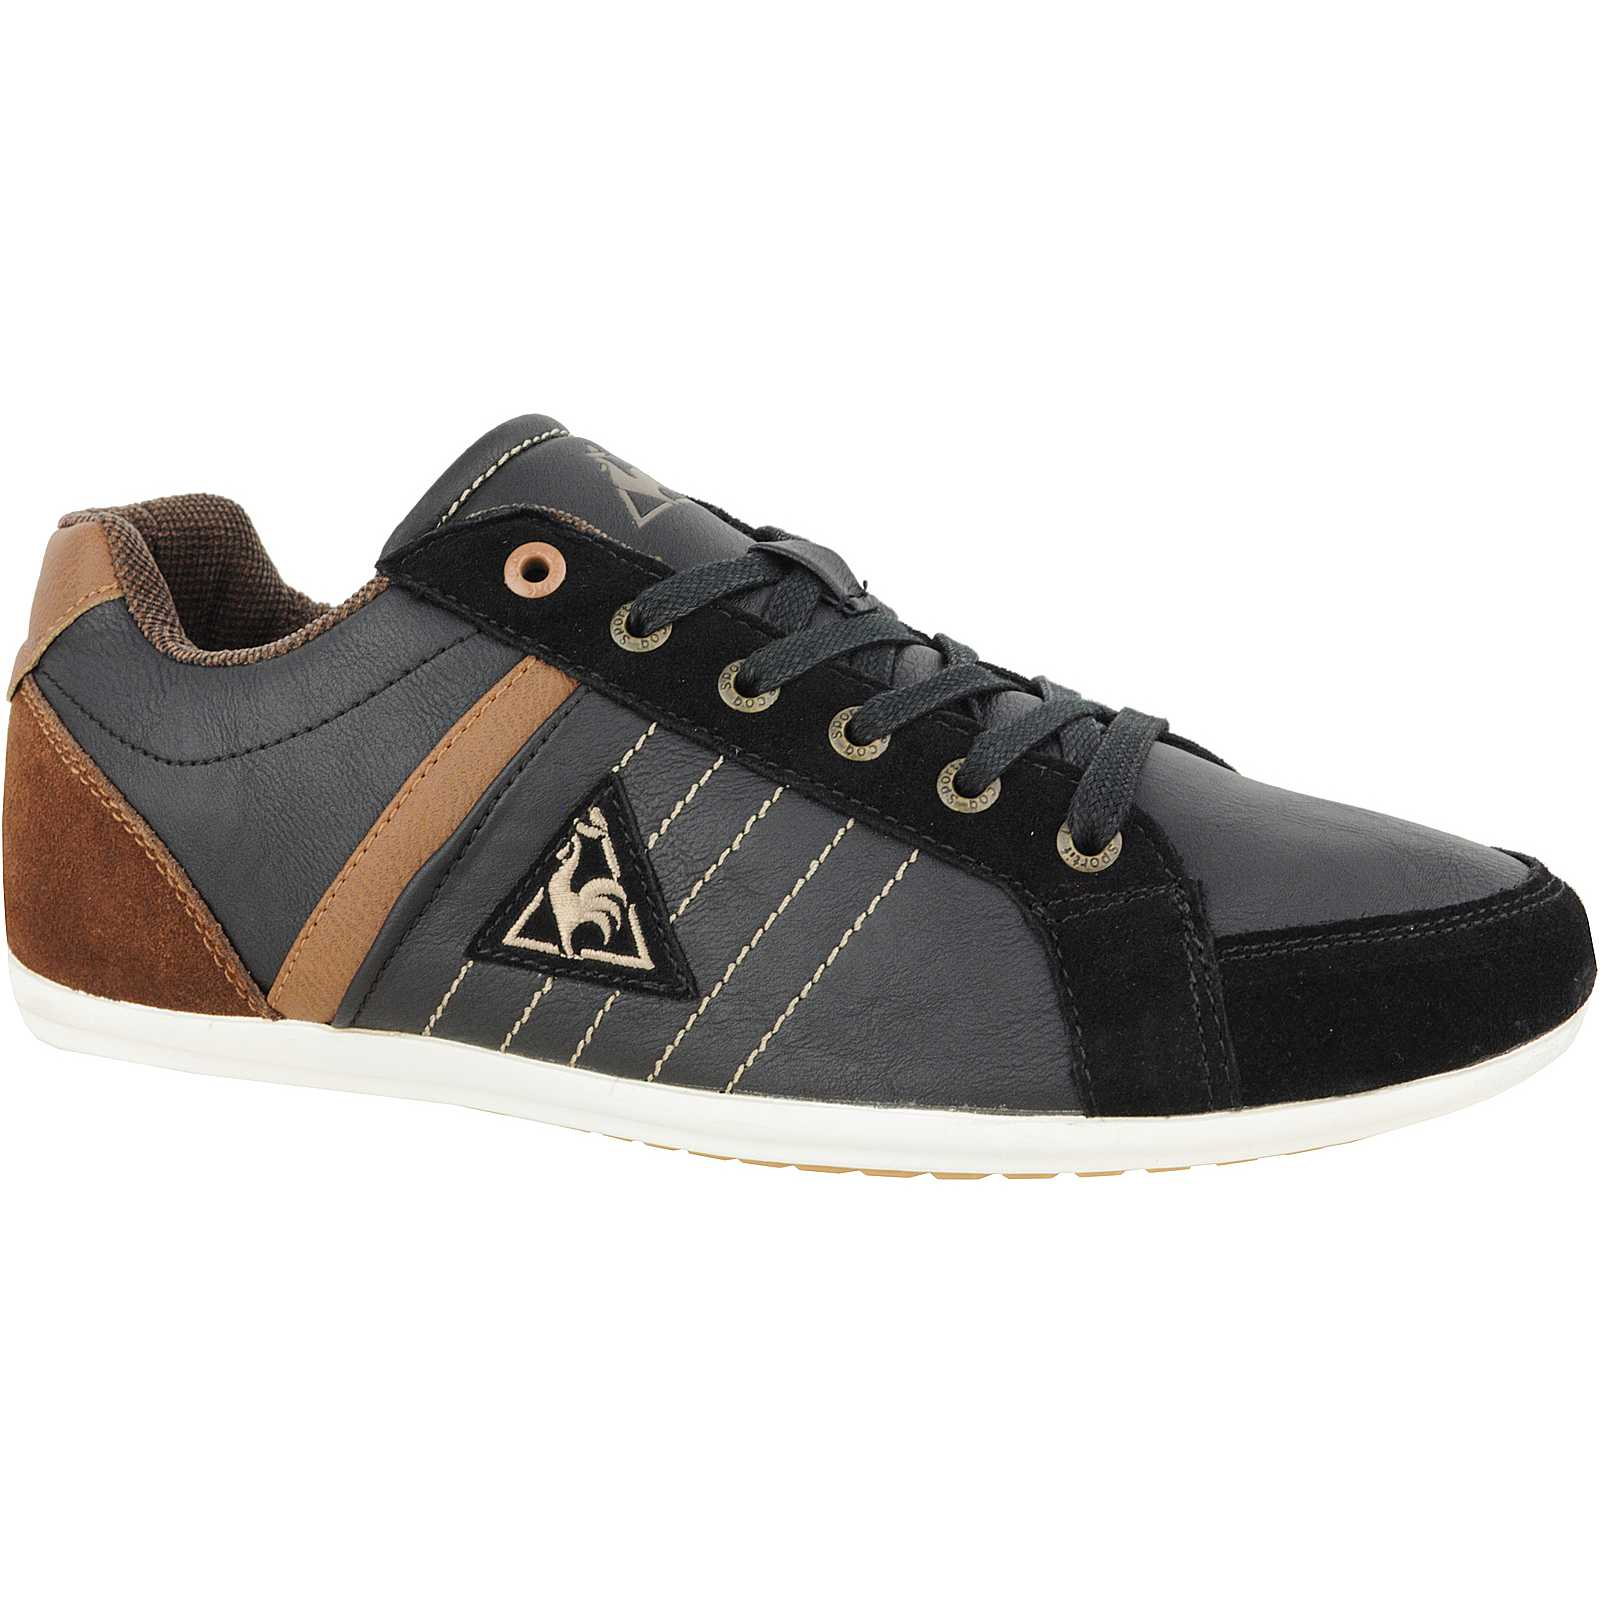 6855cc95aa4cc5 Reducere Pantofi casual barbati Le Coq Sportif Verne Low Sr 0101175825Y